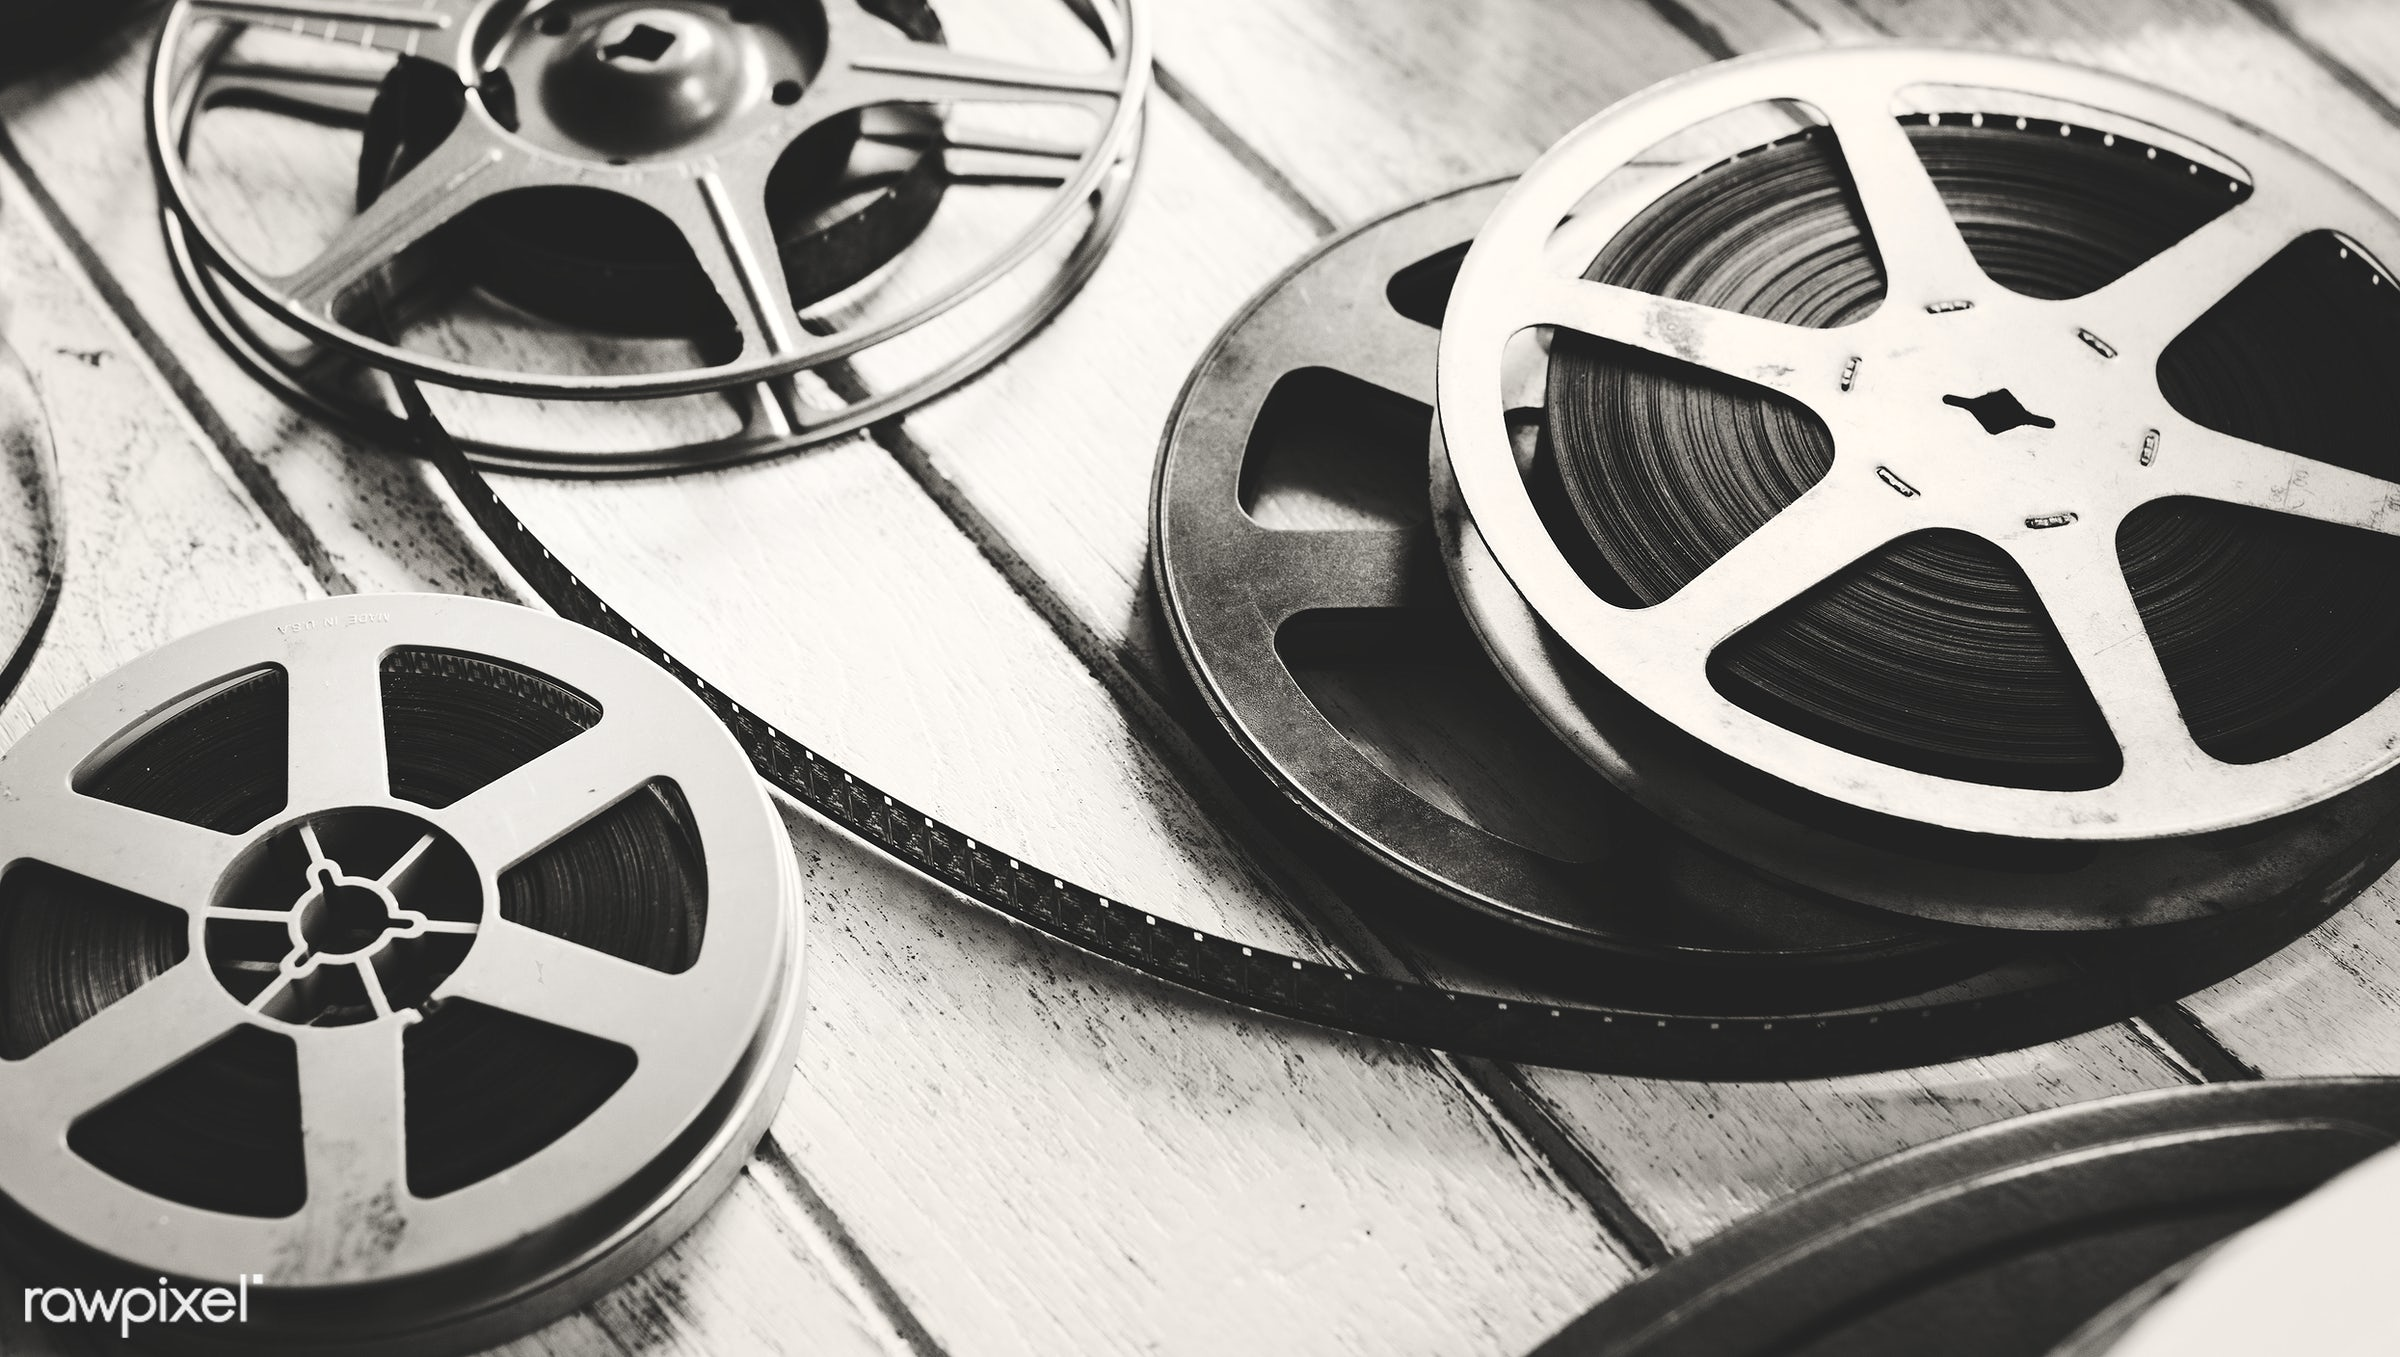 Vintage film strip isolated on wooden floor - film, cinema, action, analog, antique, entertainment, equipment, film strip,...